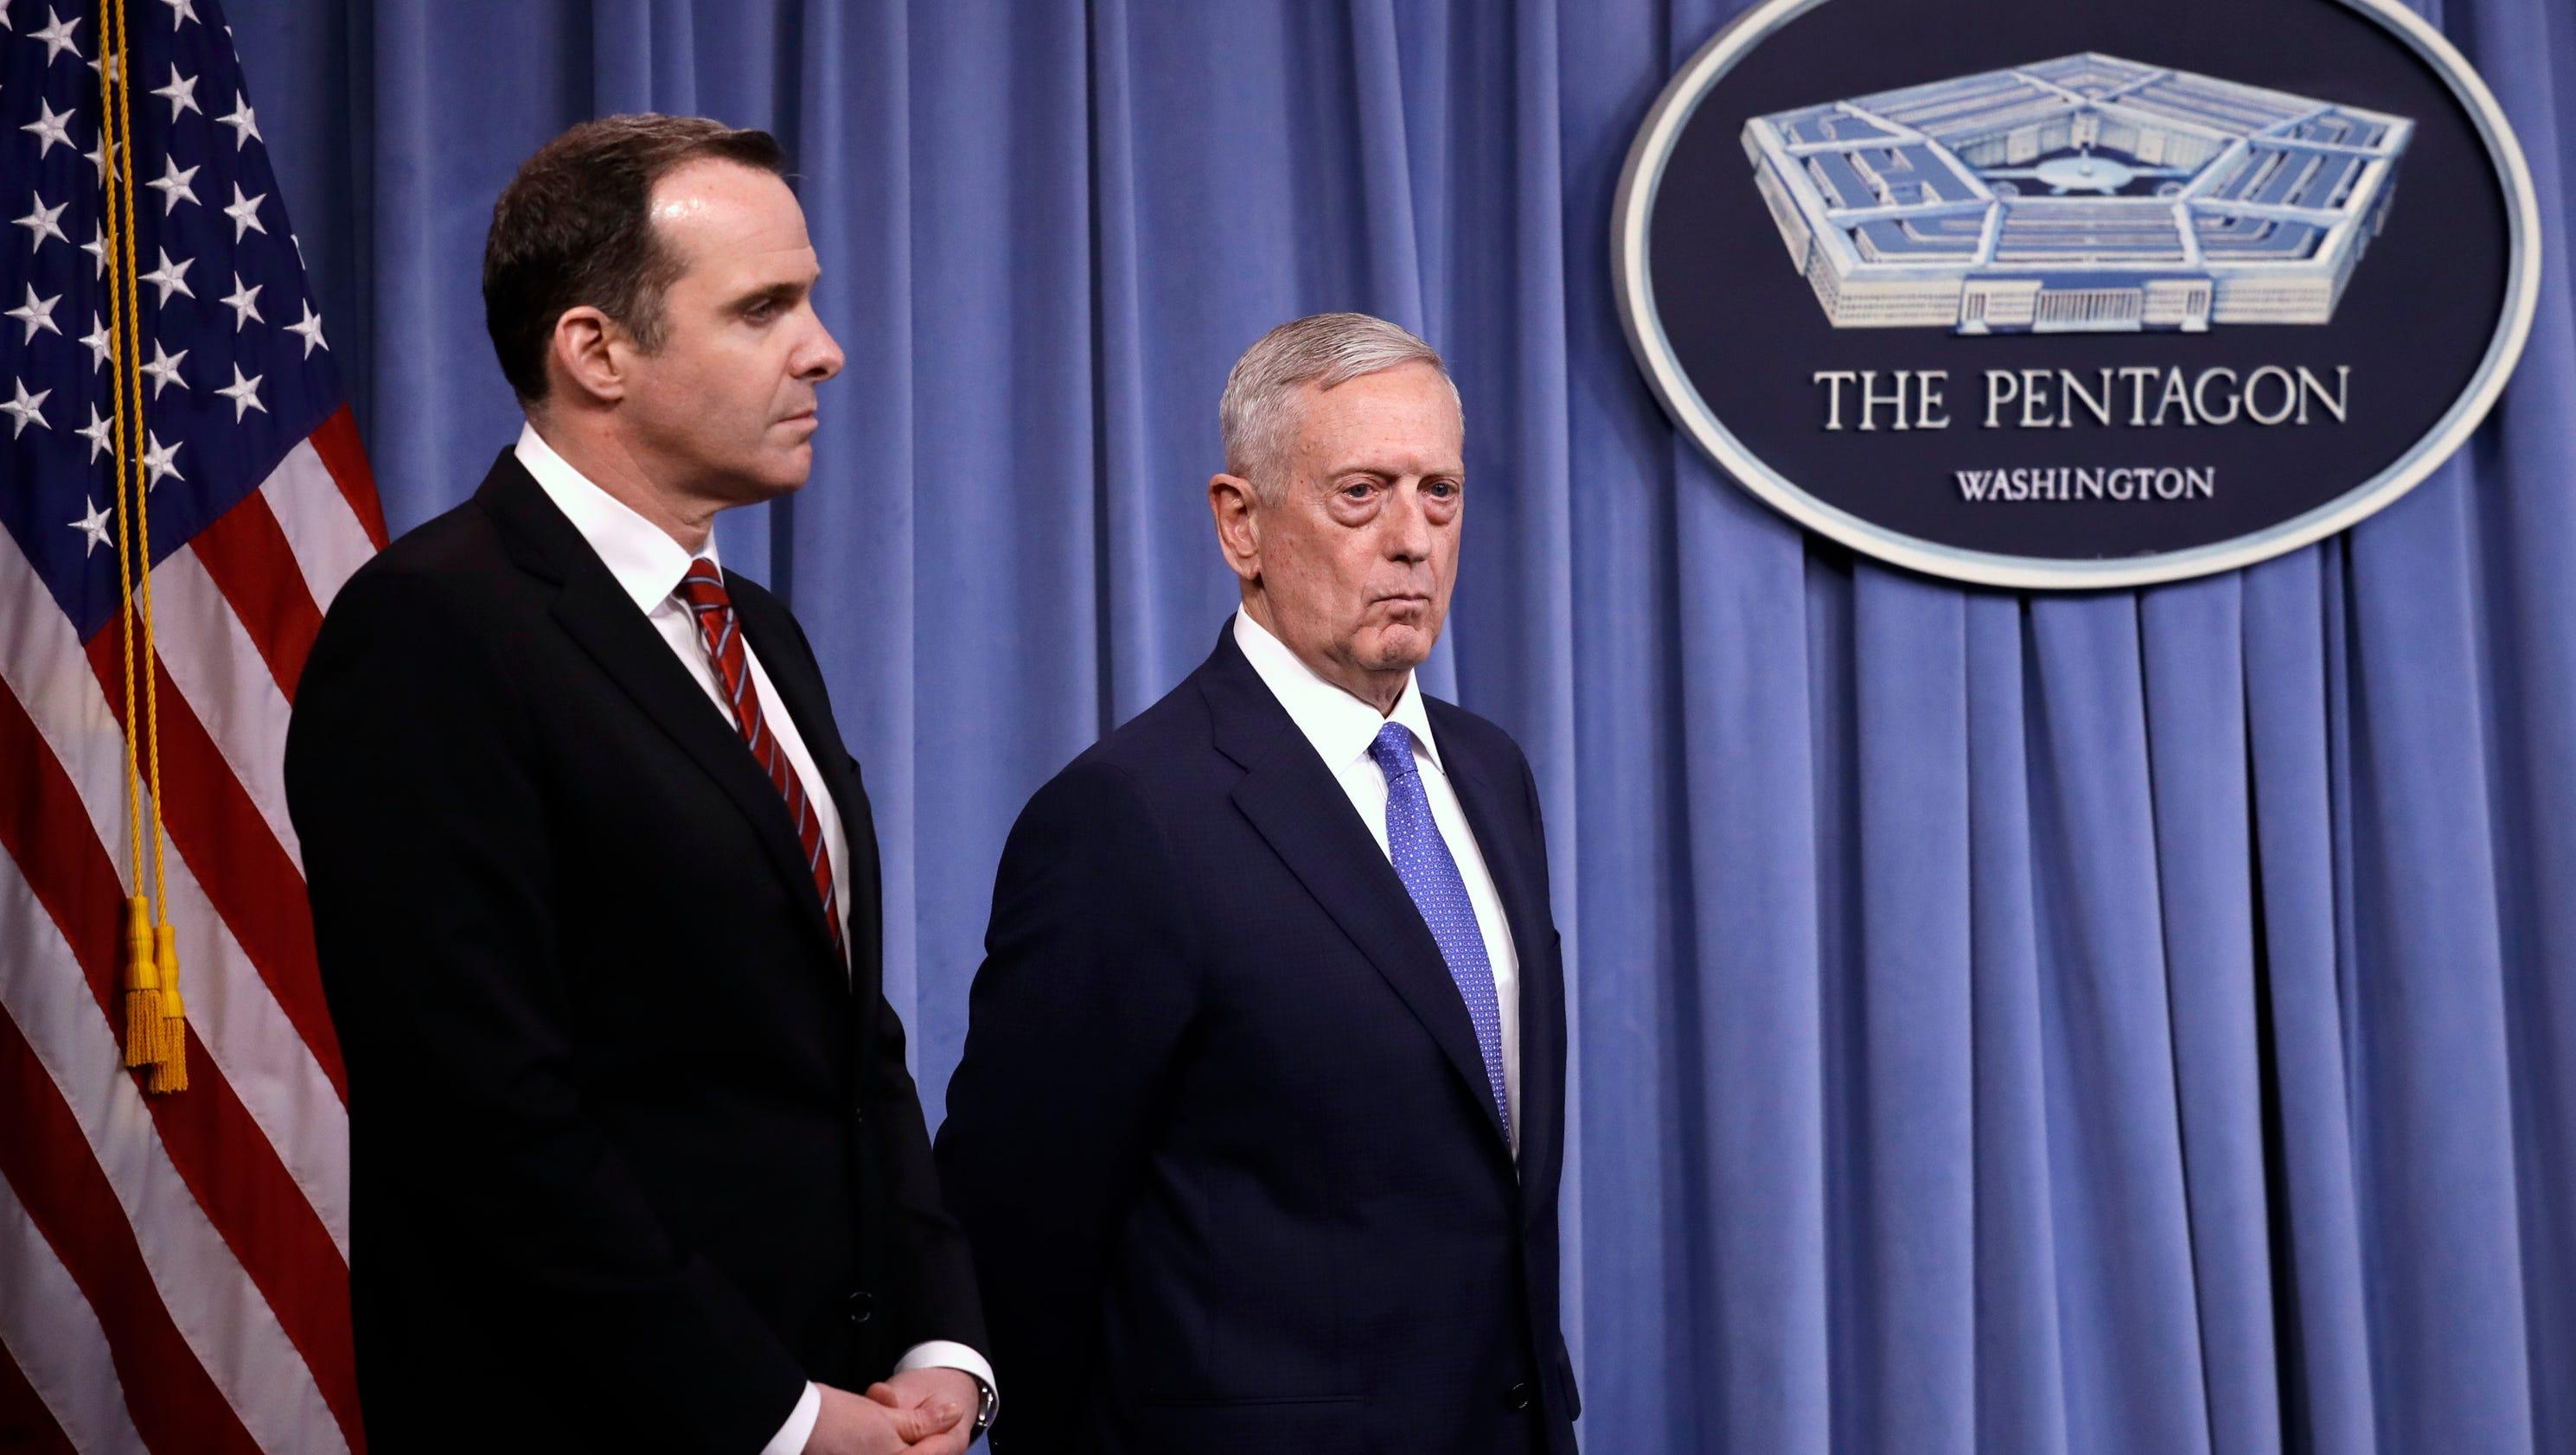 Defense Secretary Jim Mattis says President Trump's orders will annihilate ISIS